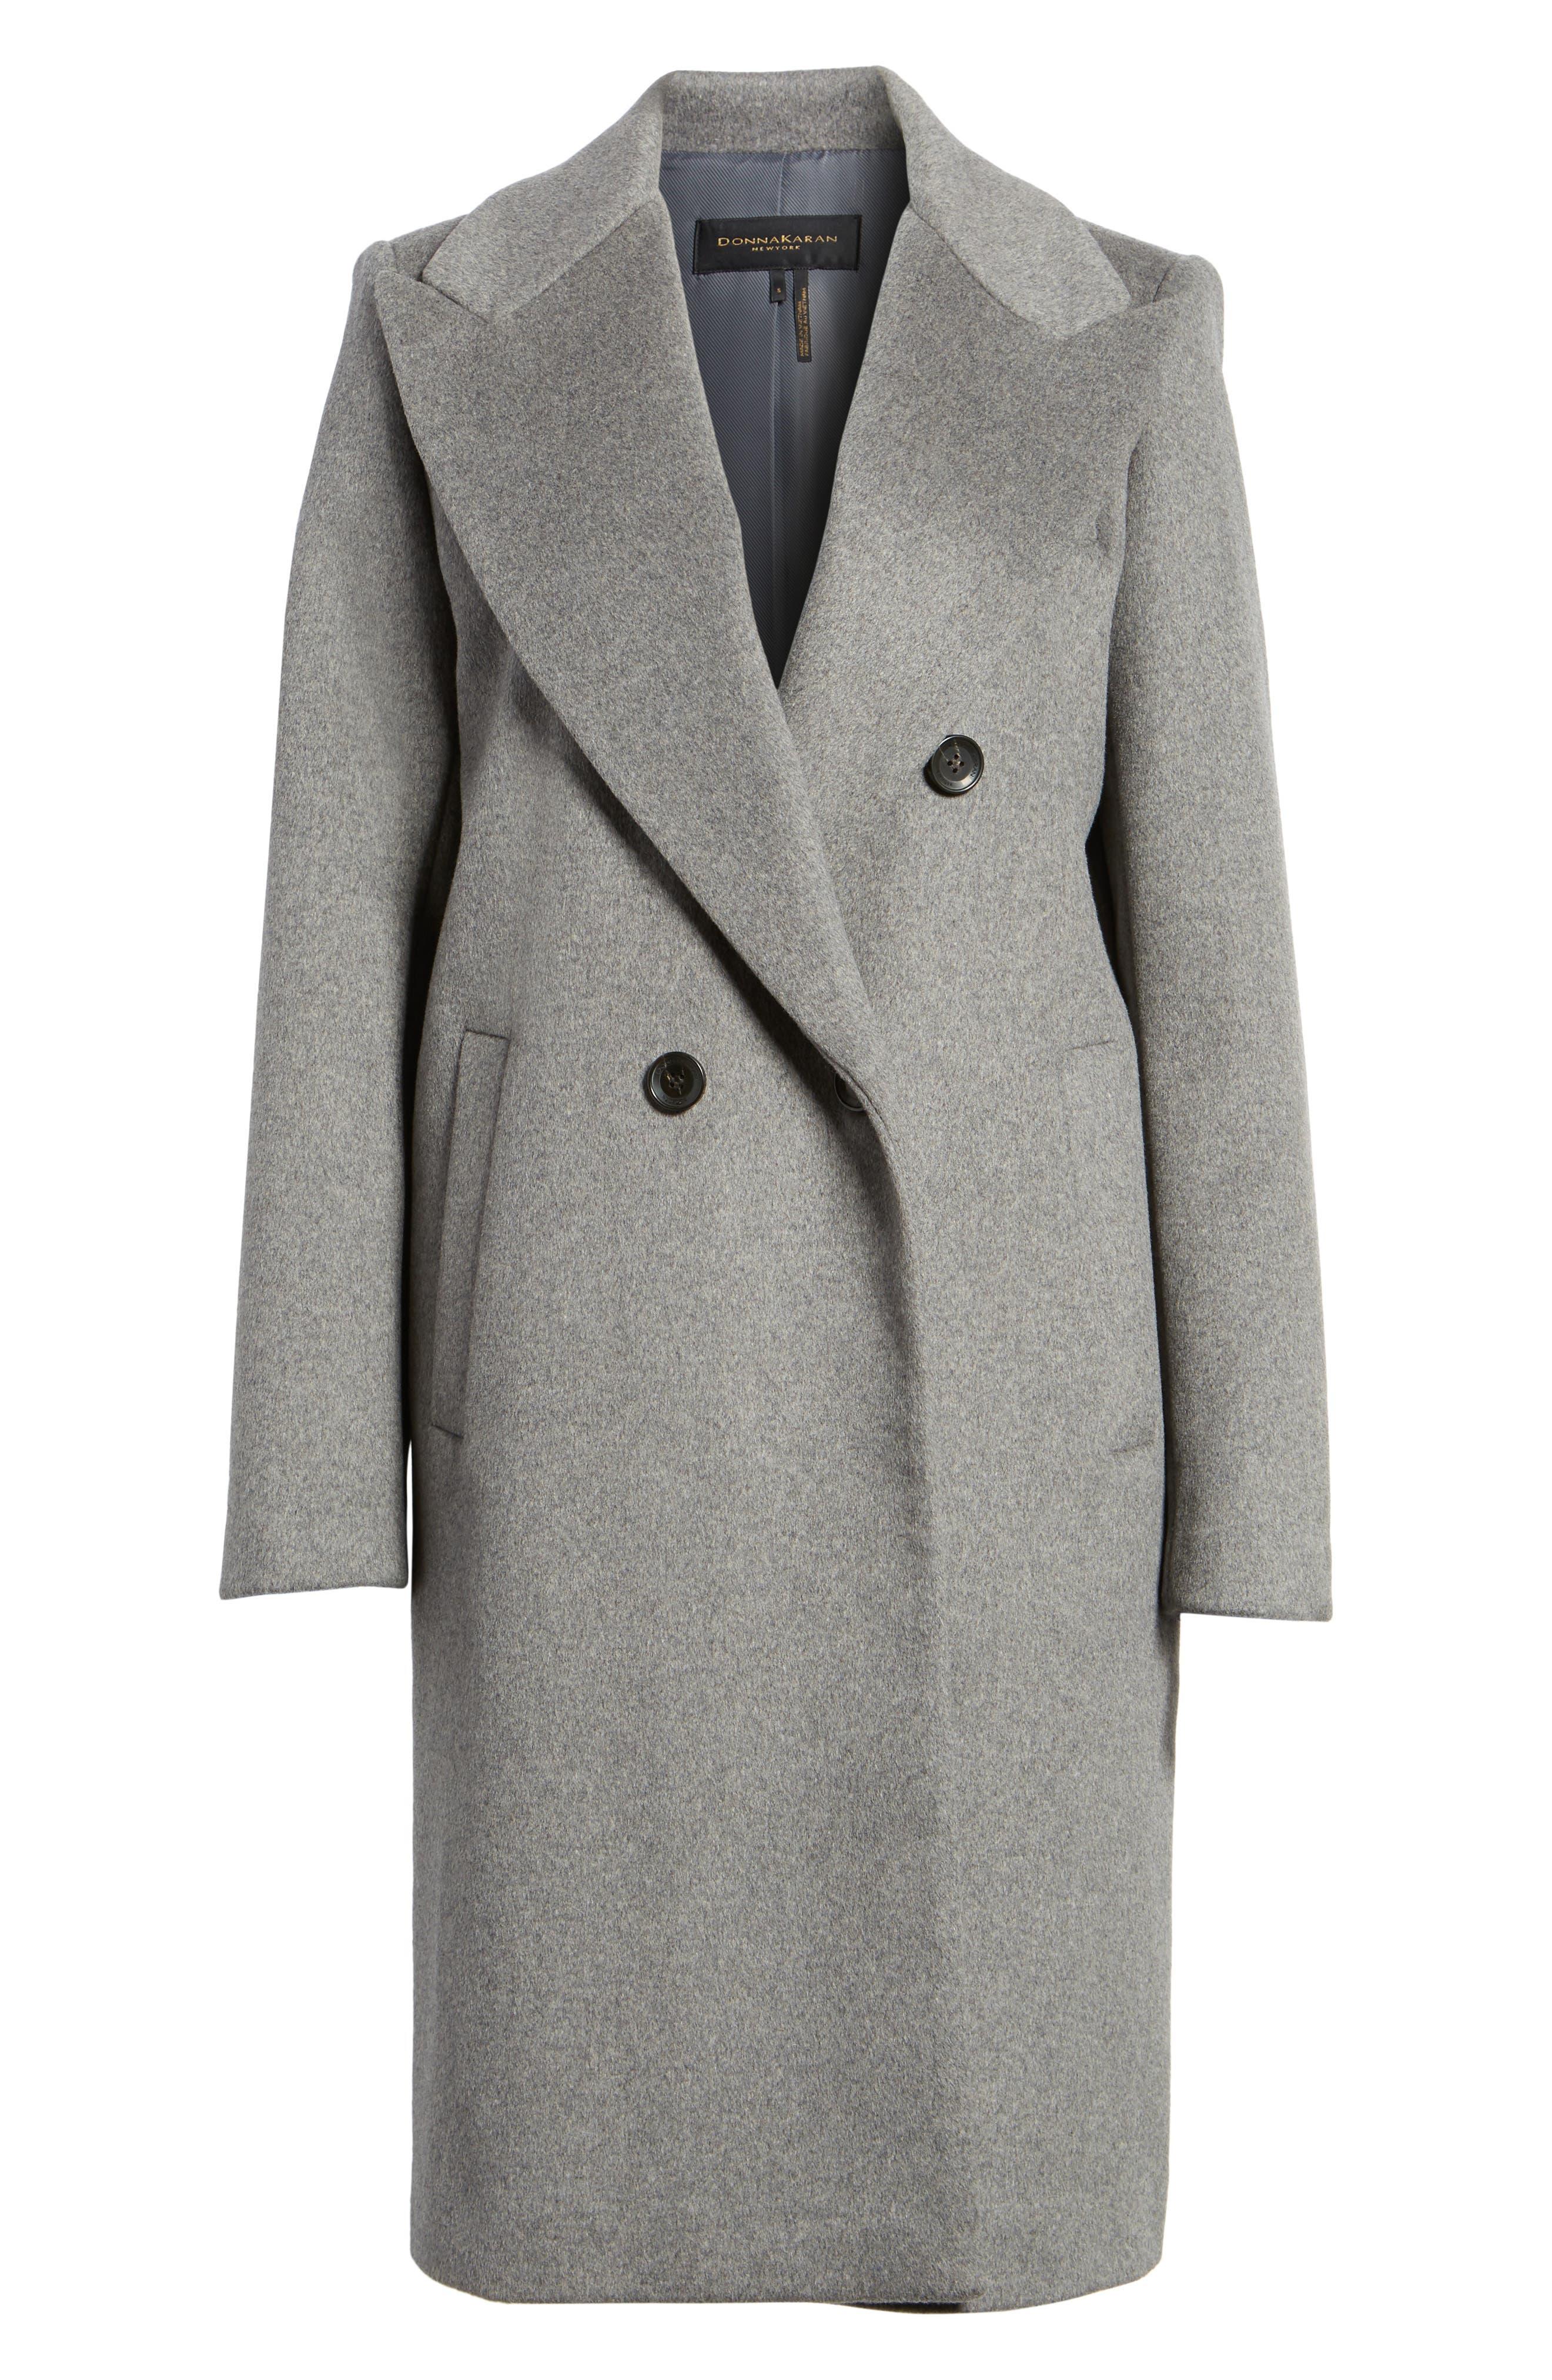 DKNY Lavish Wool Blend Coat,                             Alternate thumbnail 10, color,